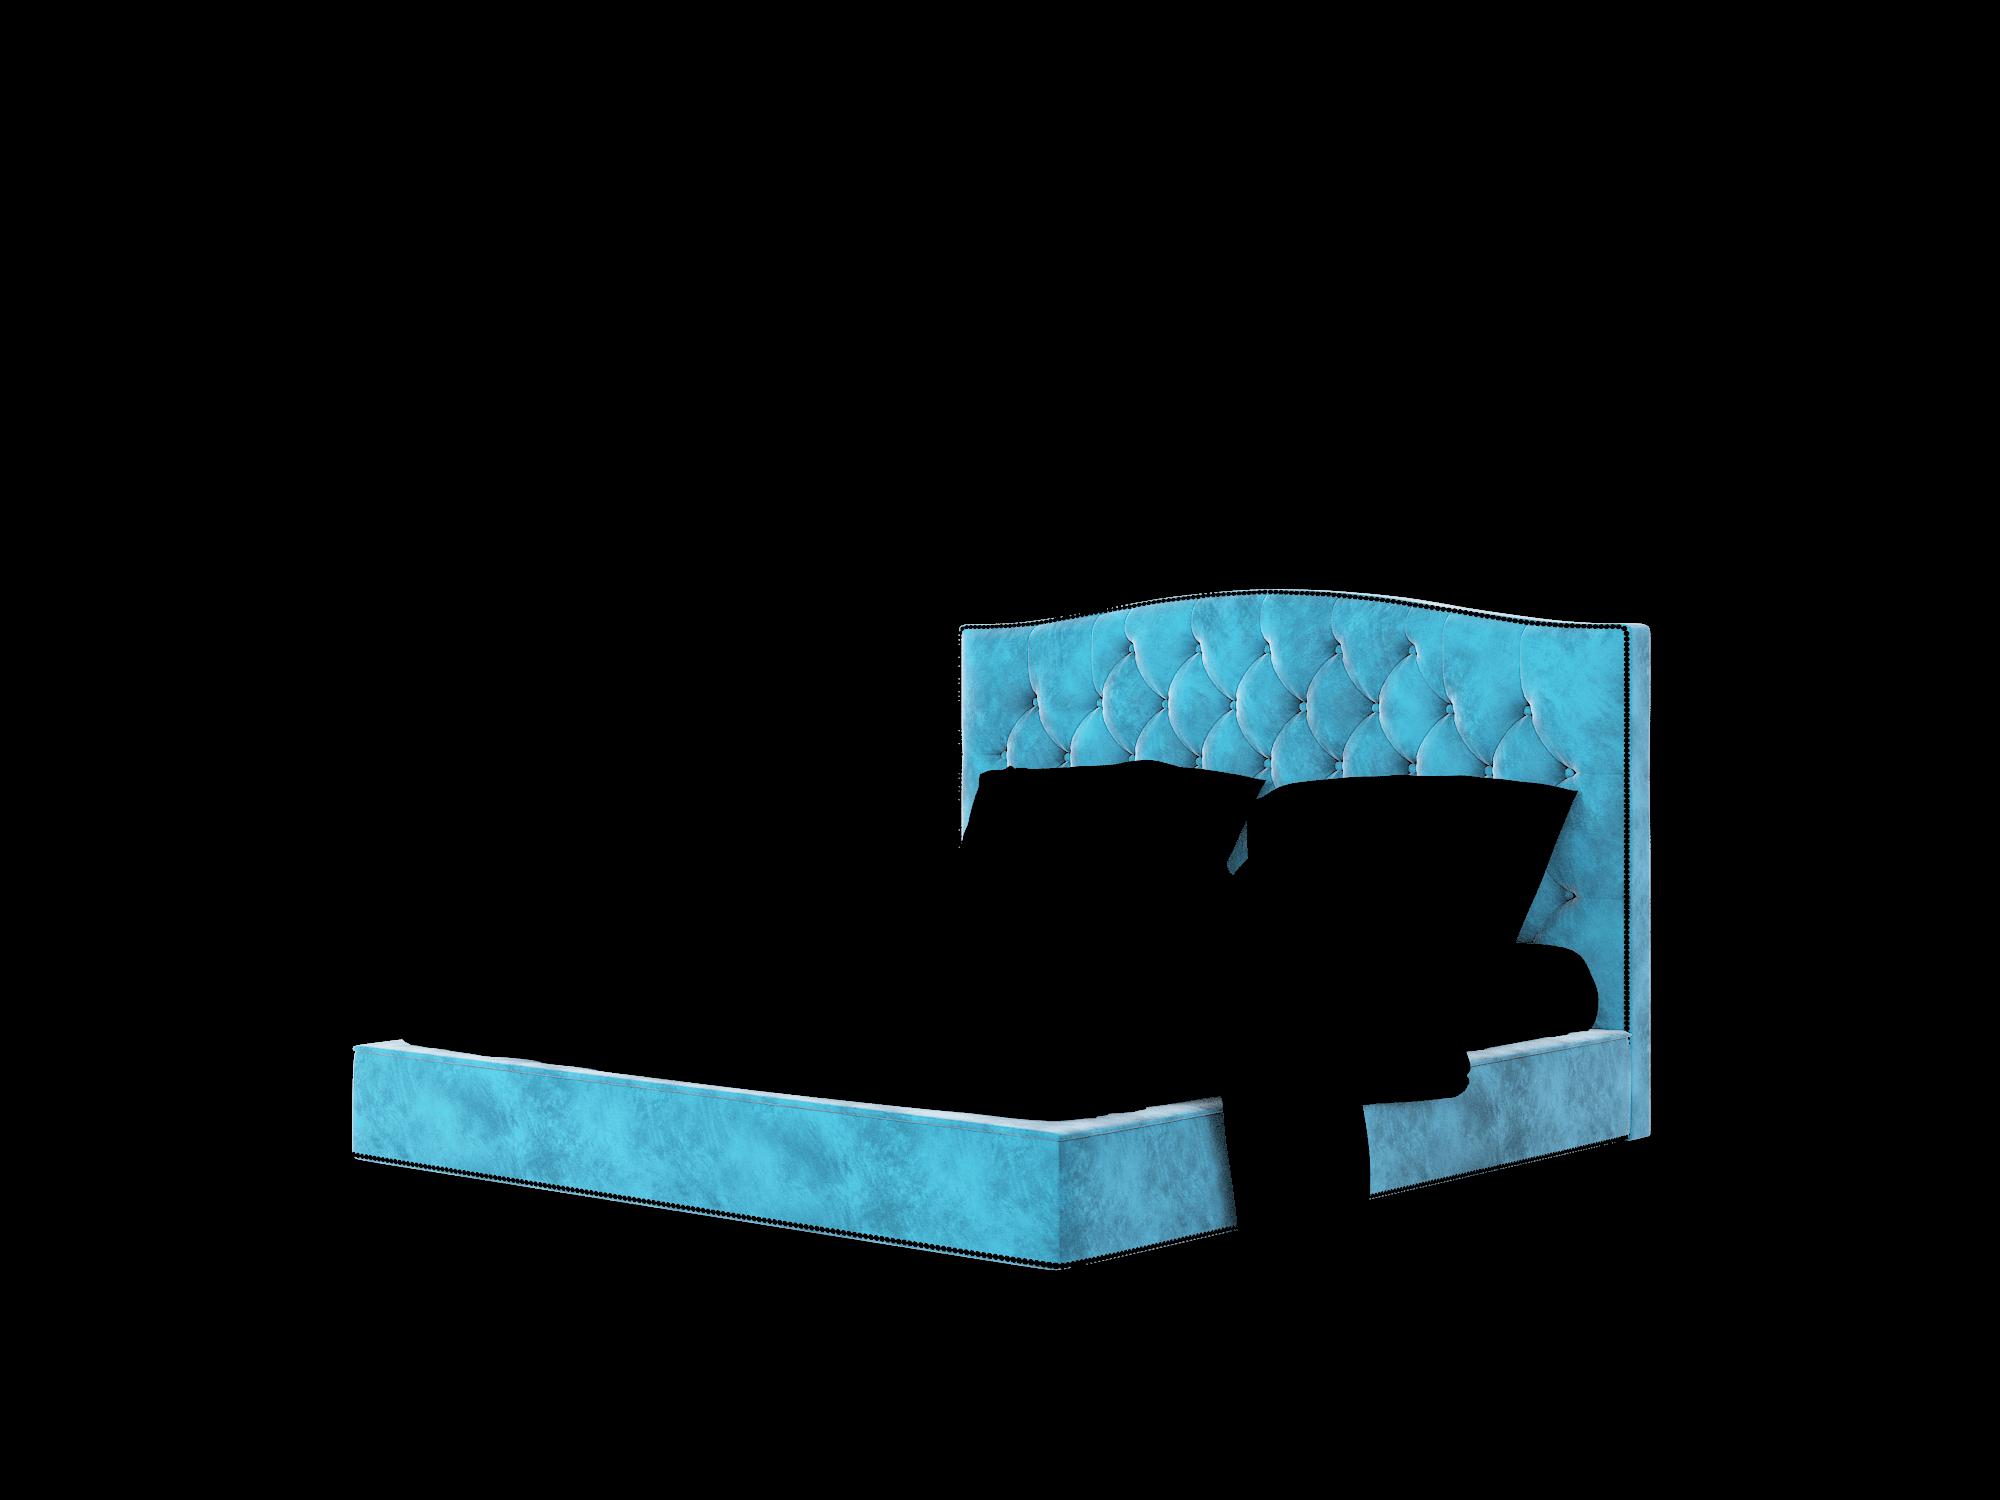 Bijou Buzz Teal Bed King Room Texture